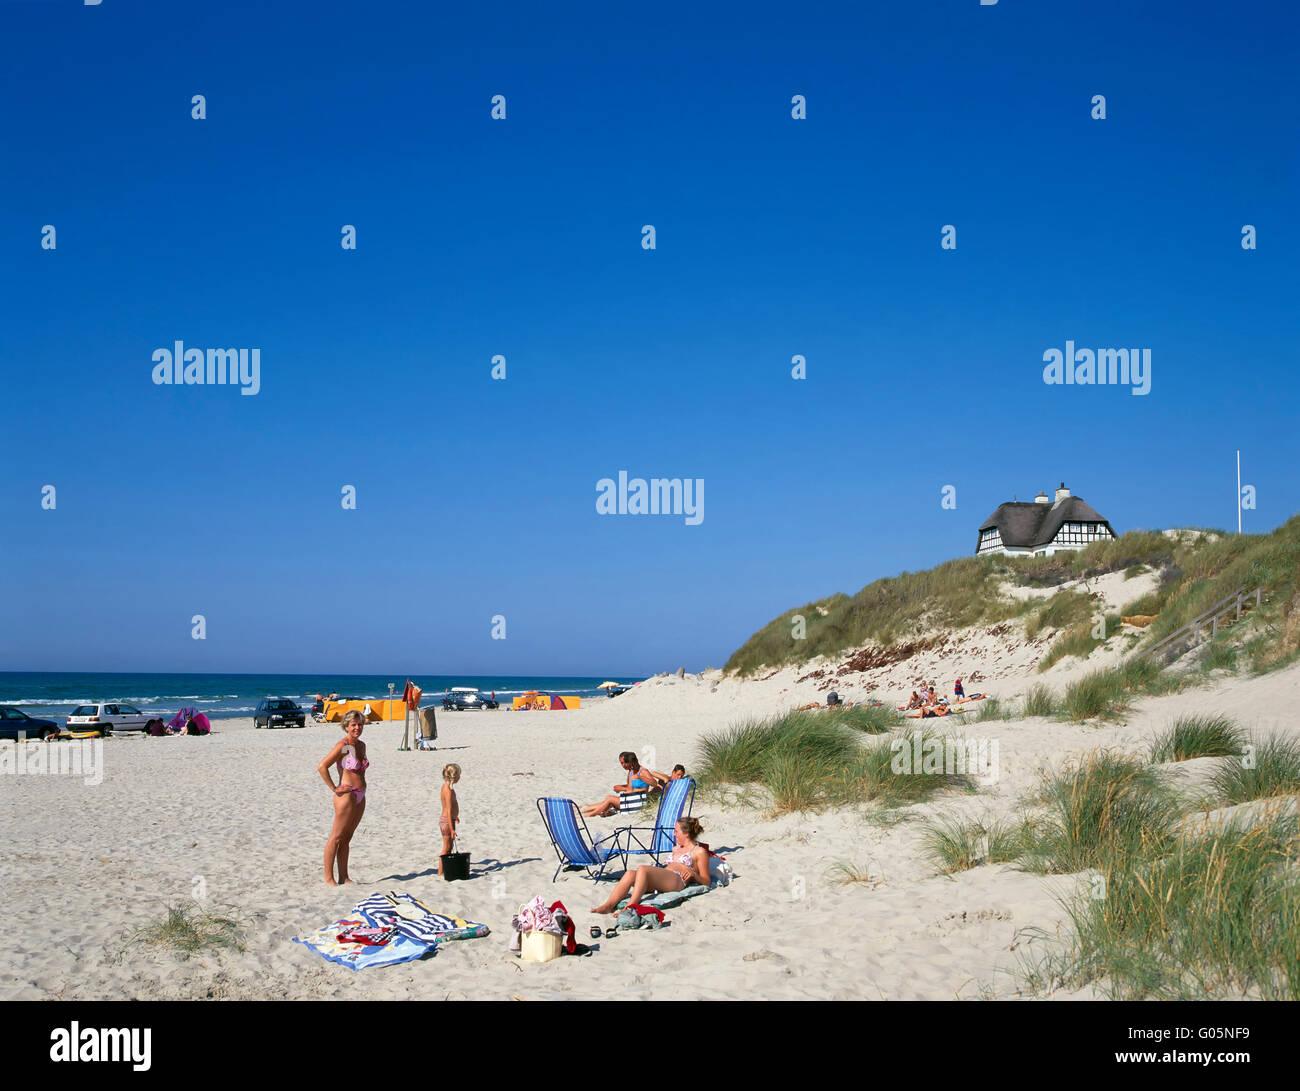 Loekken, beach and holiday house in the dunes,  northern Jutland, Denmark, Scandinavia, Europe - Stock Image